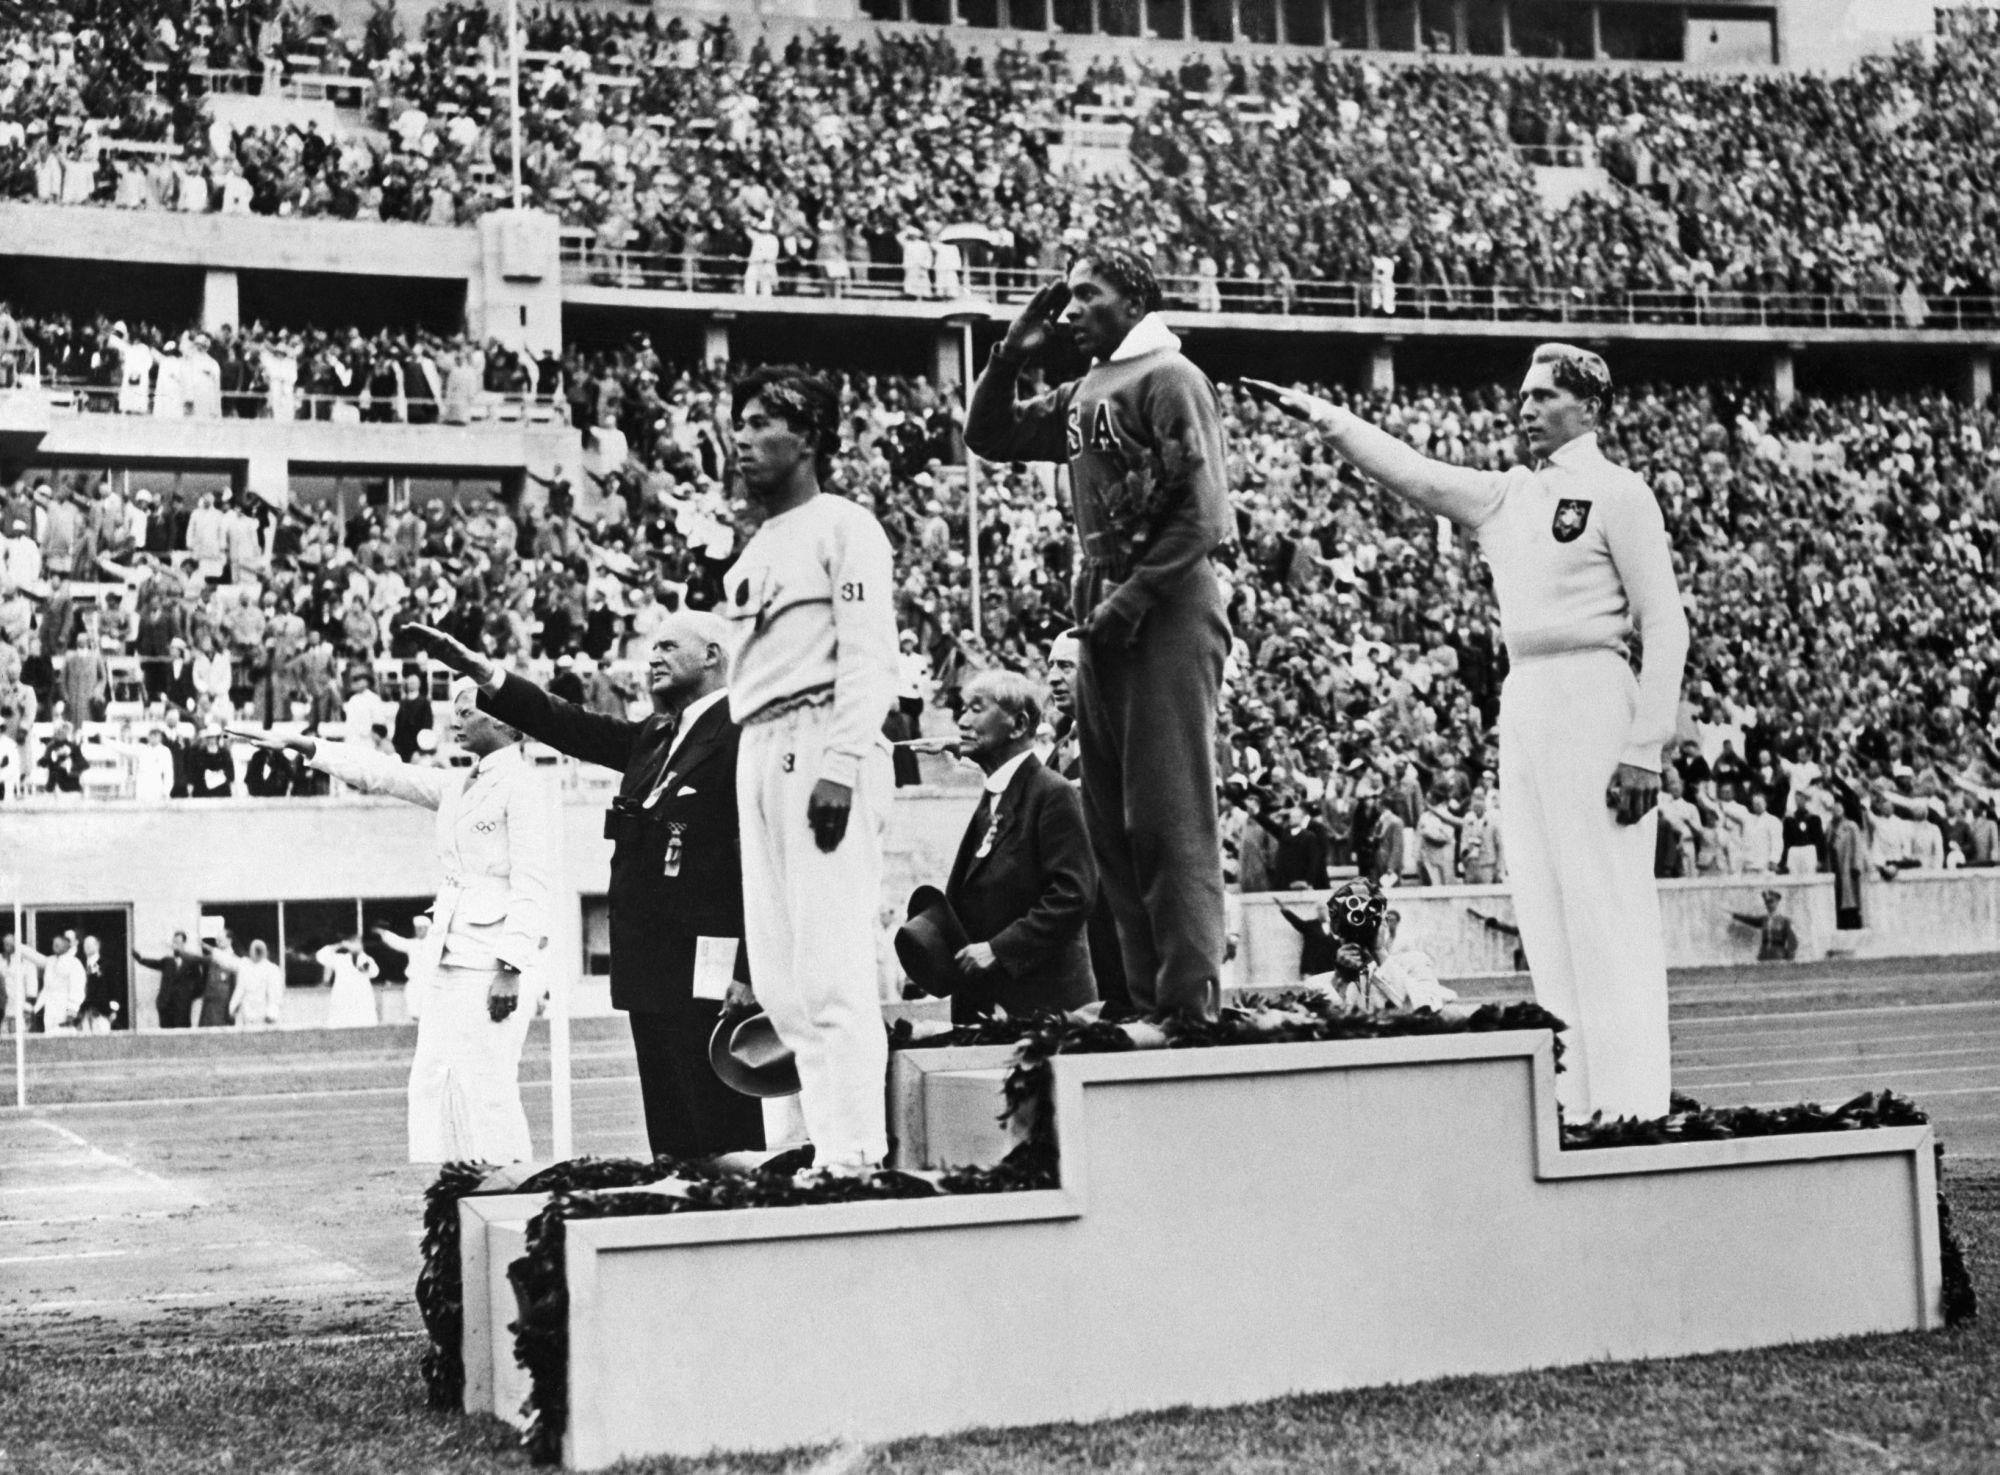 Black Athletes Defy Jim Crow, Hitler In 1936 Olympics | Georgia ...